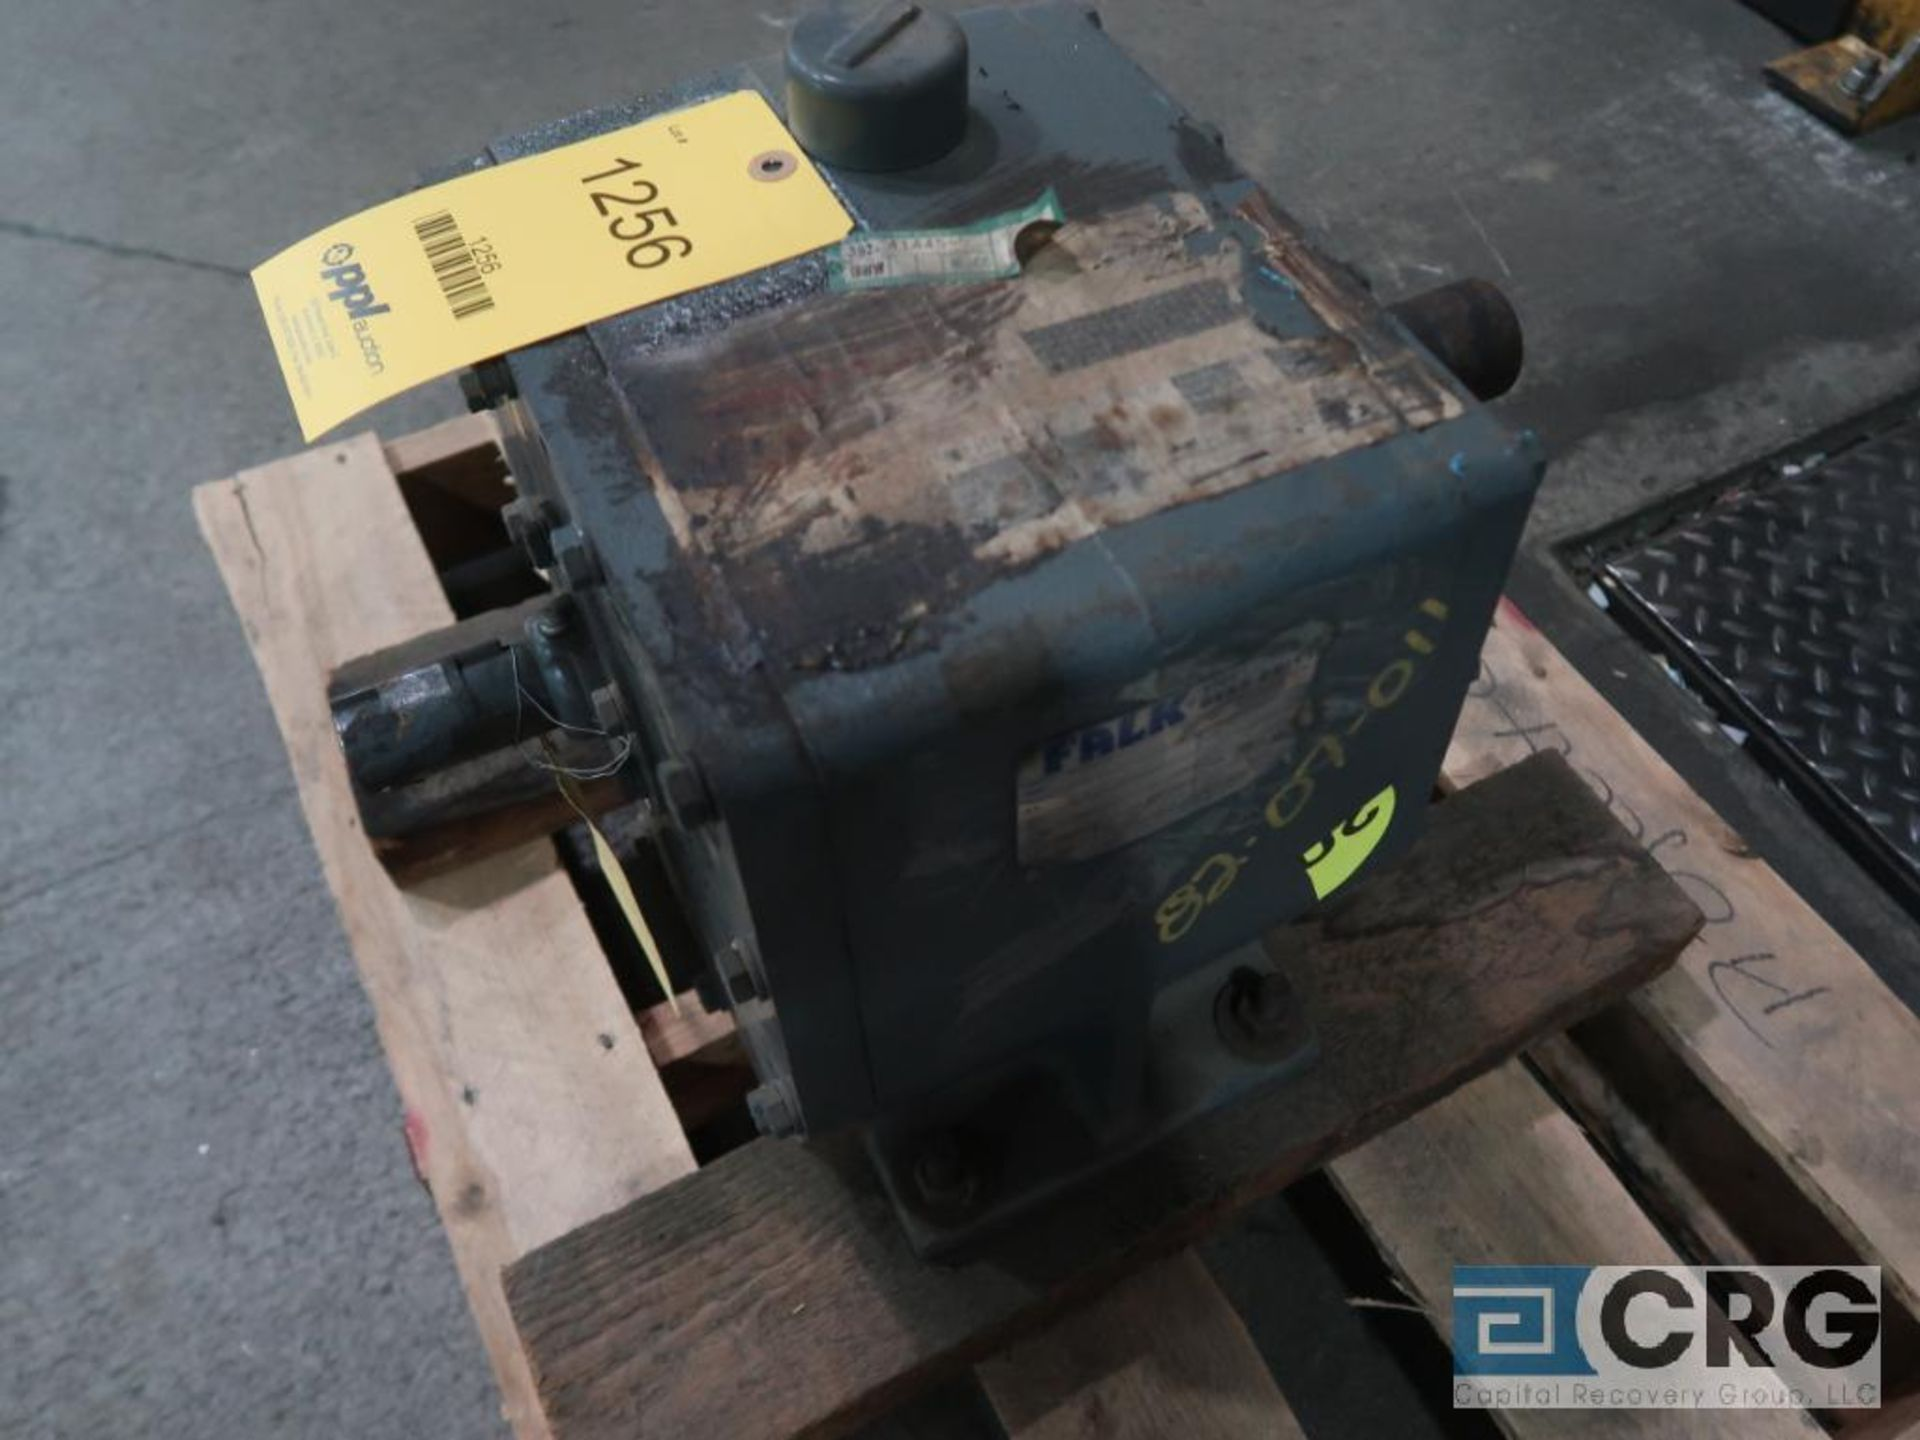 Falk 1030 FC24 gear drive, ratio 7.691, 155 RPM, s/n 96A0015 (Finish Building)